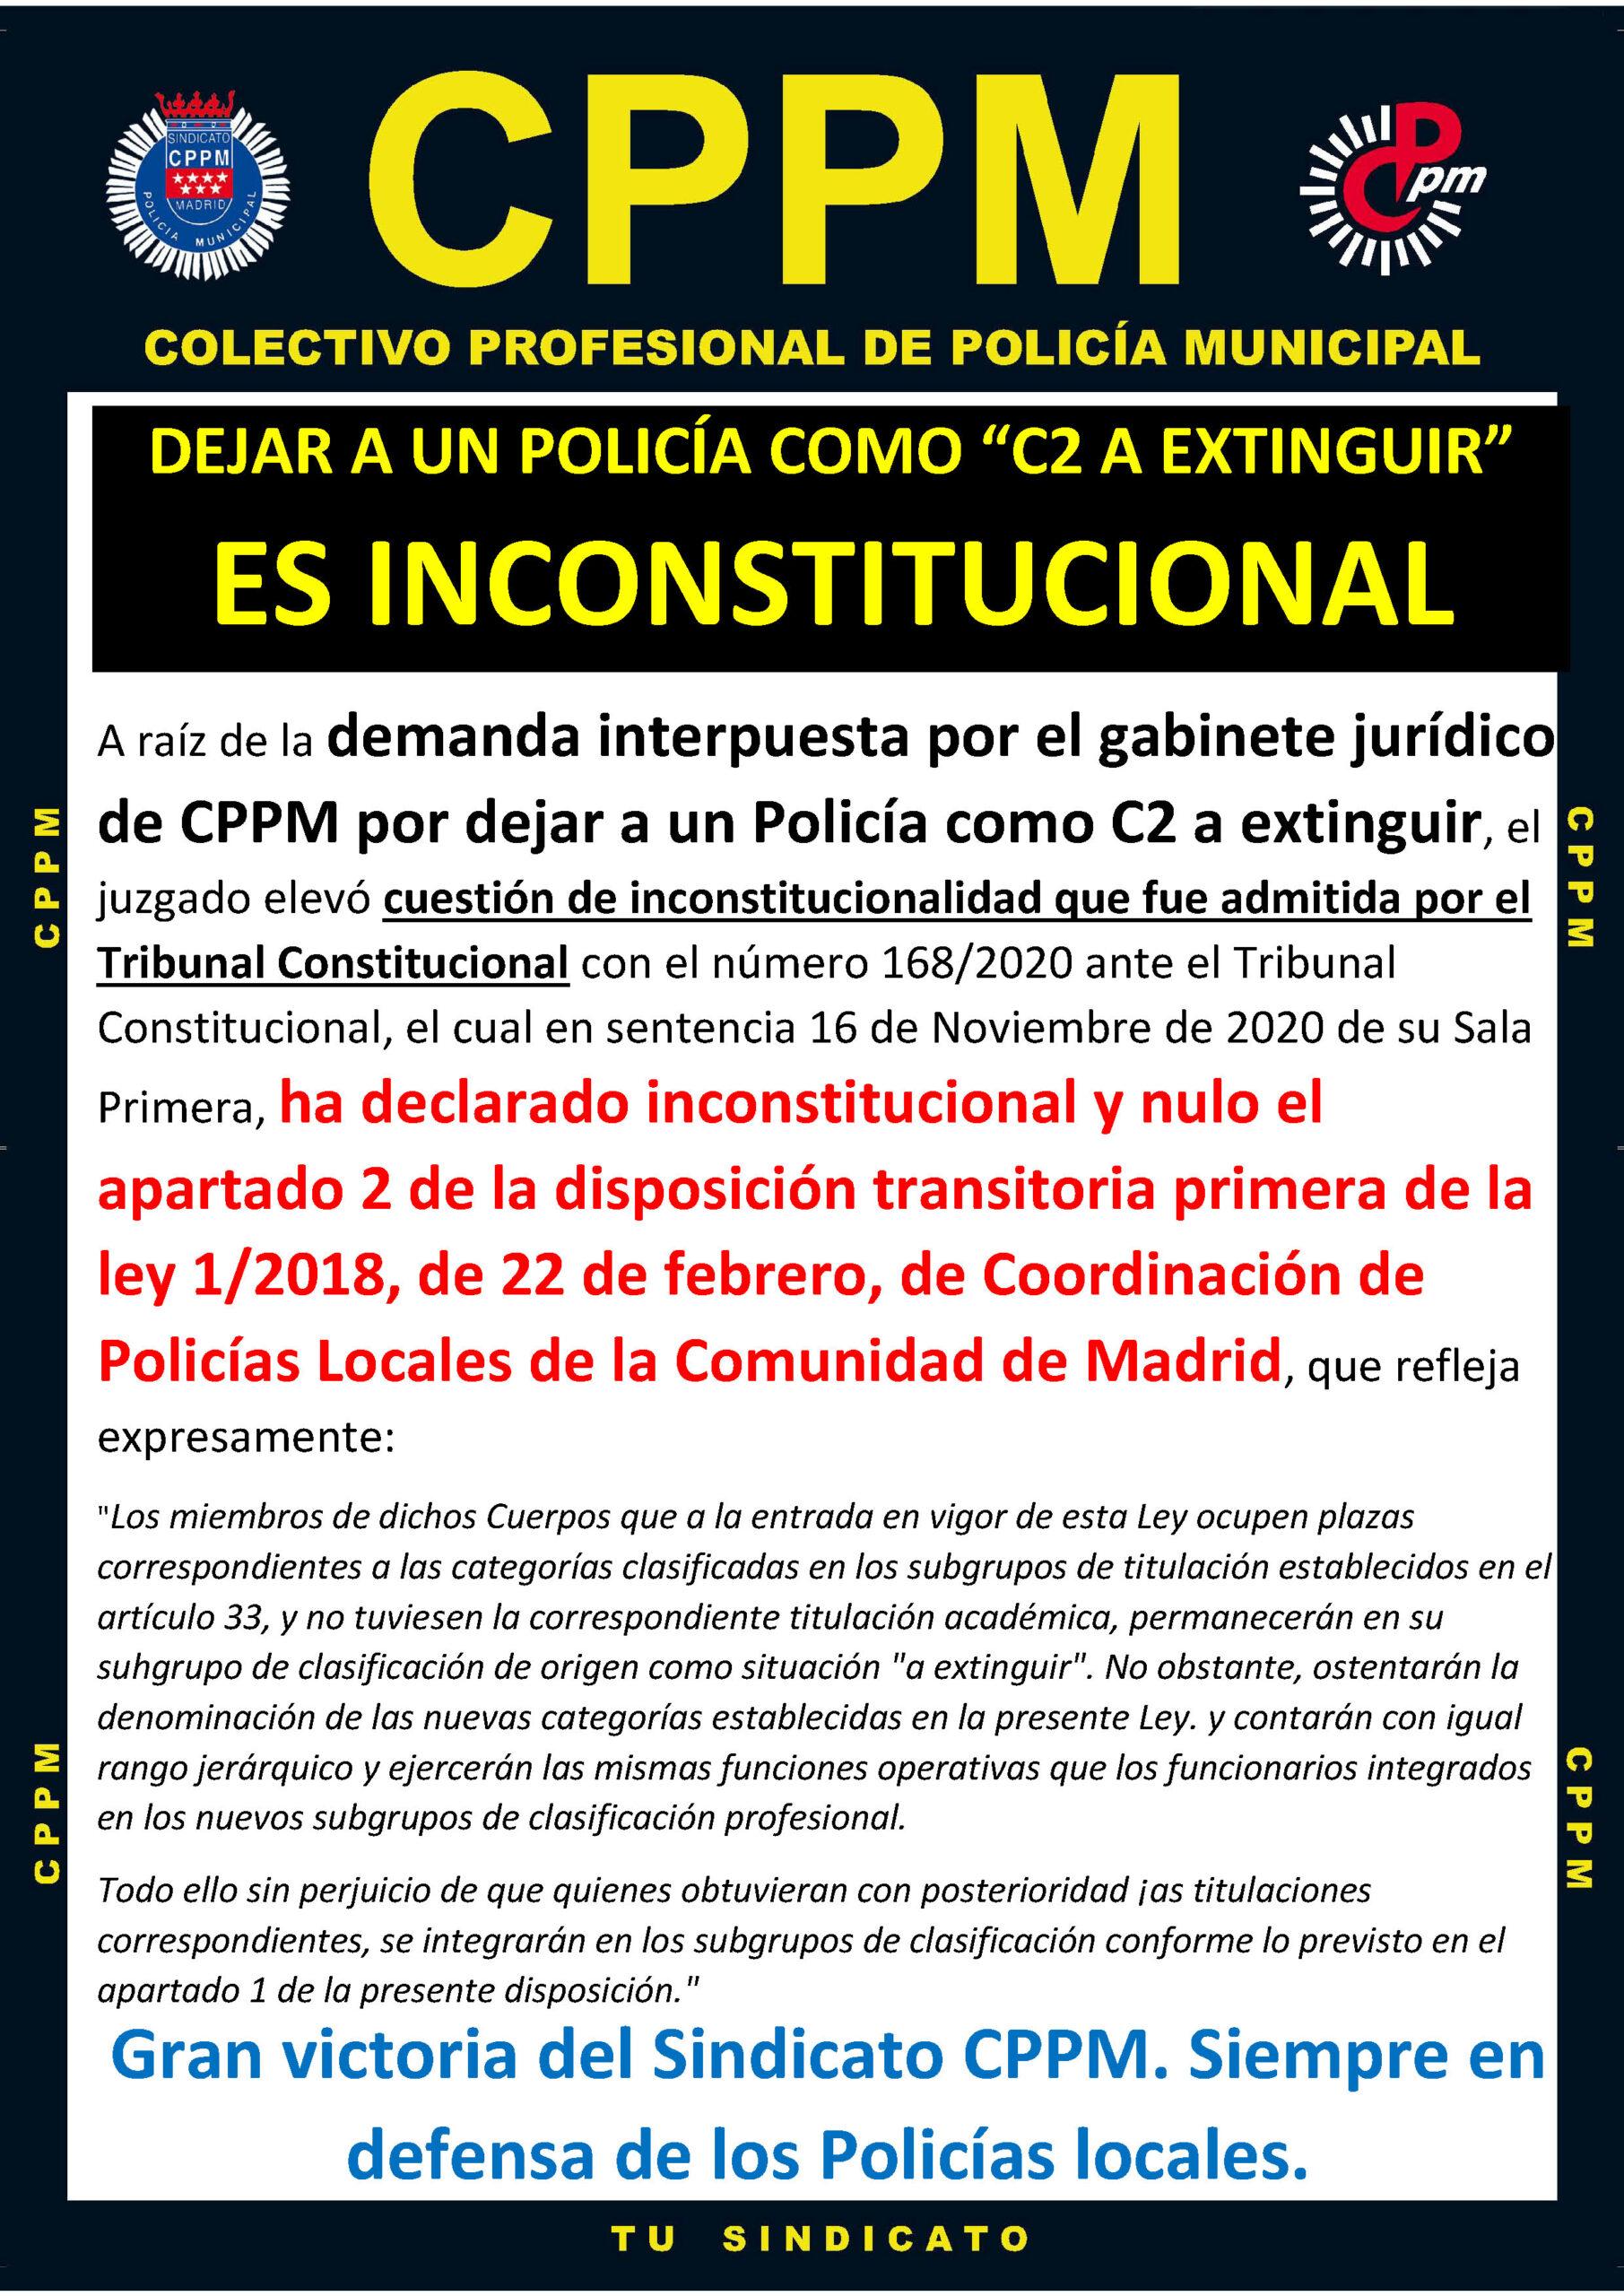 Sentencia Inconstitucional c2 a extinguir policias locales